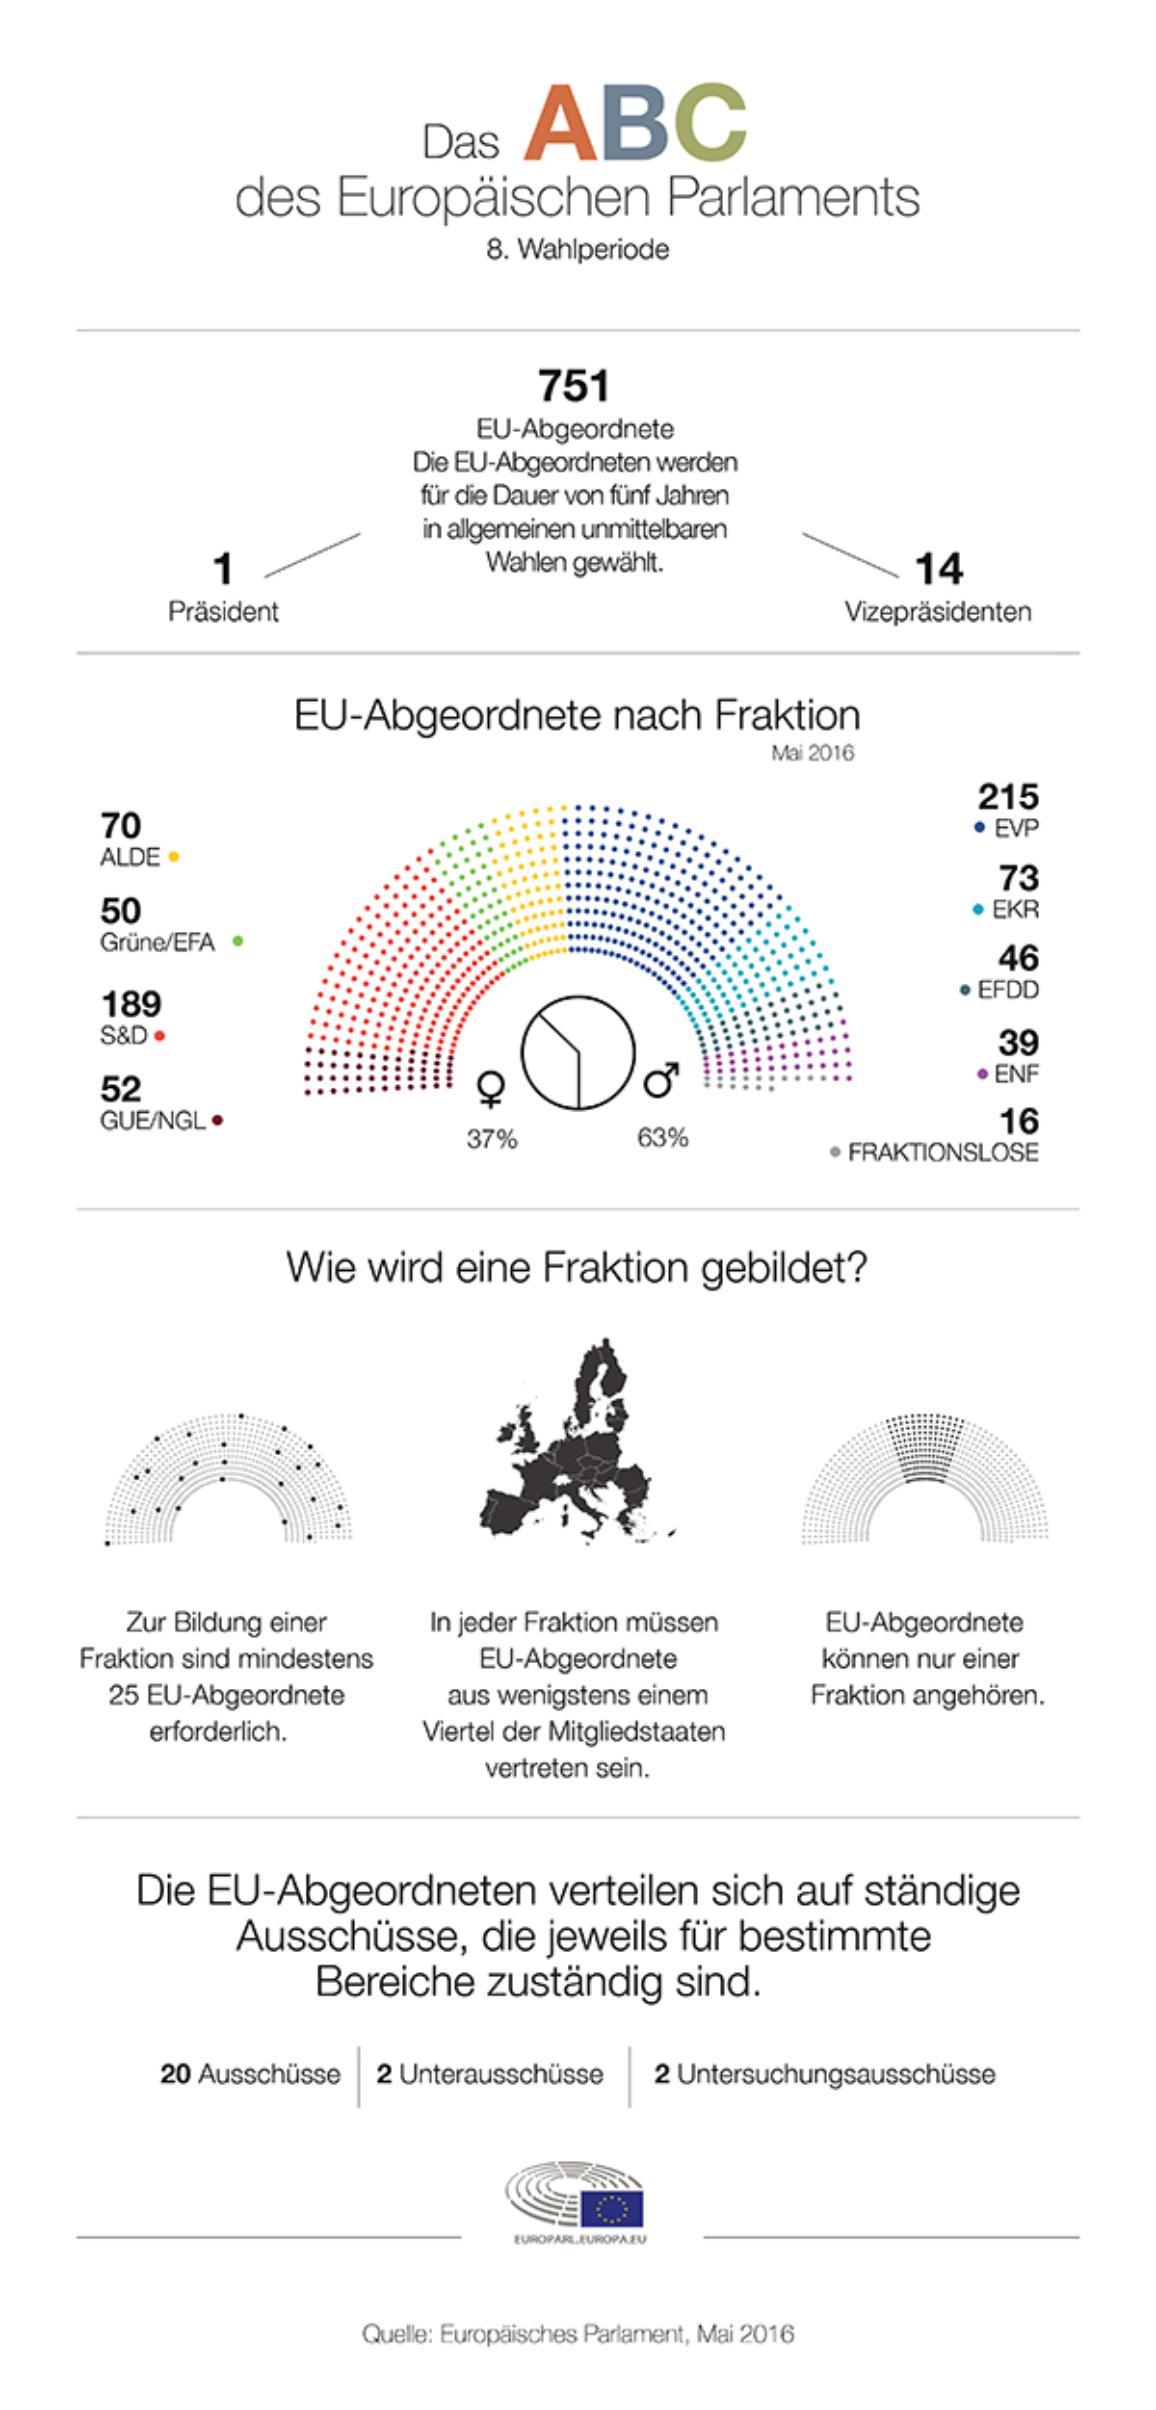 ABC-parliament-DE.jpg